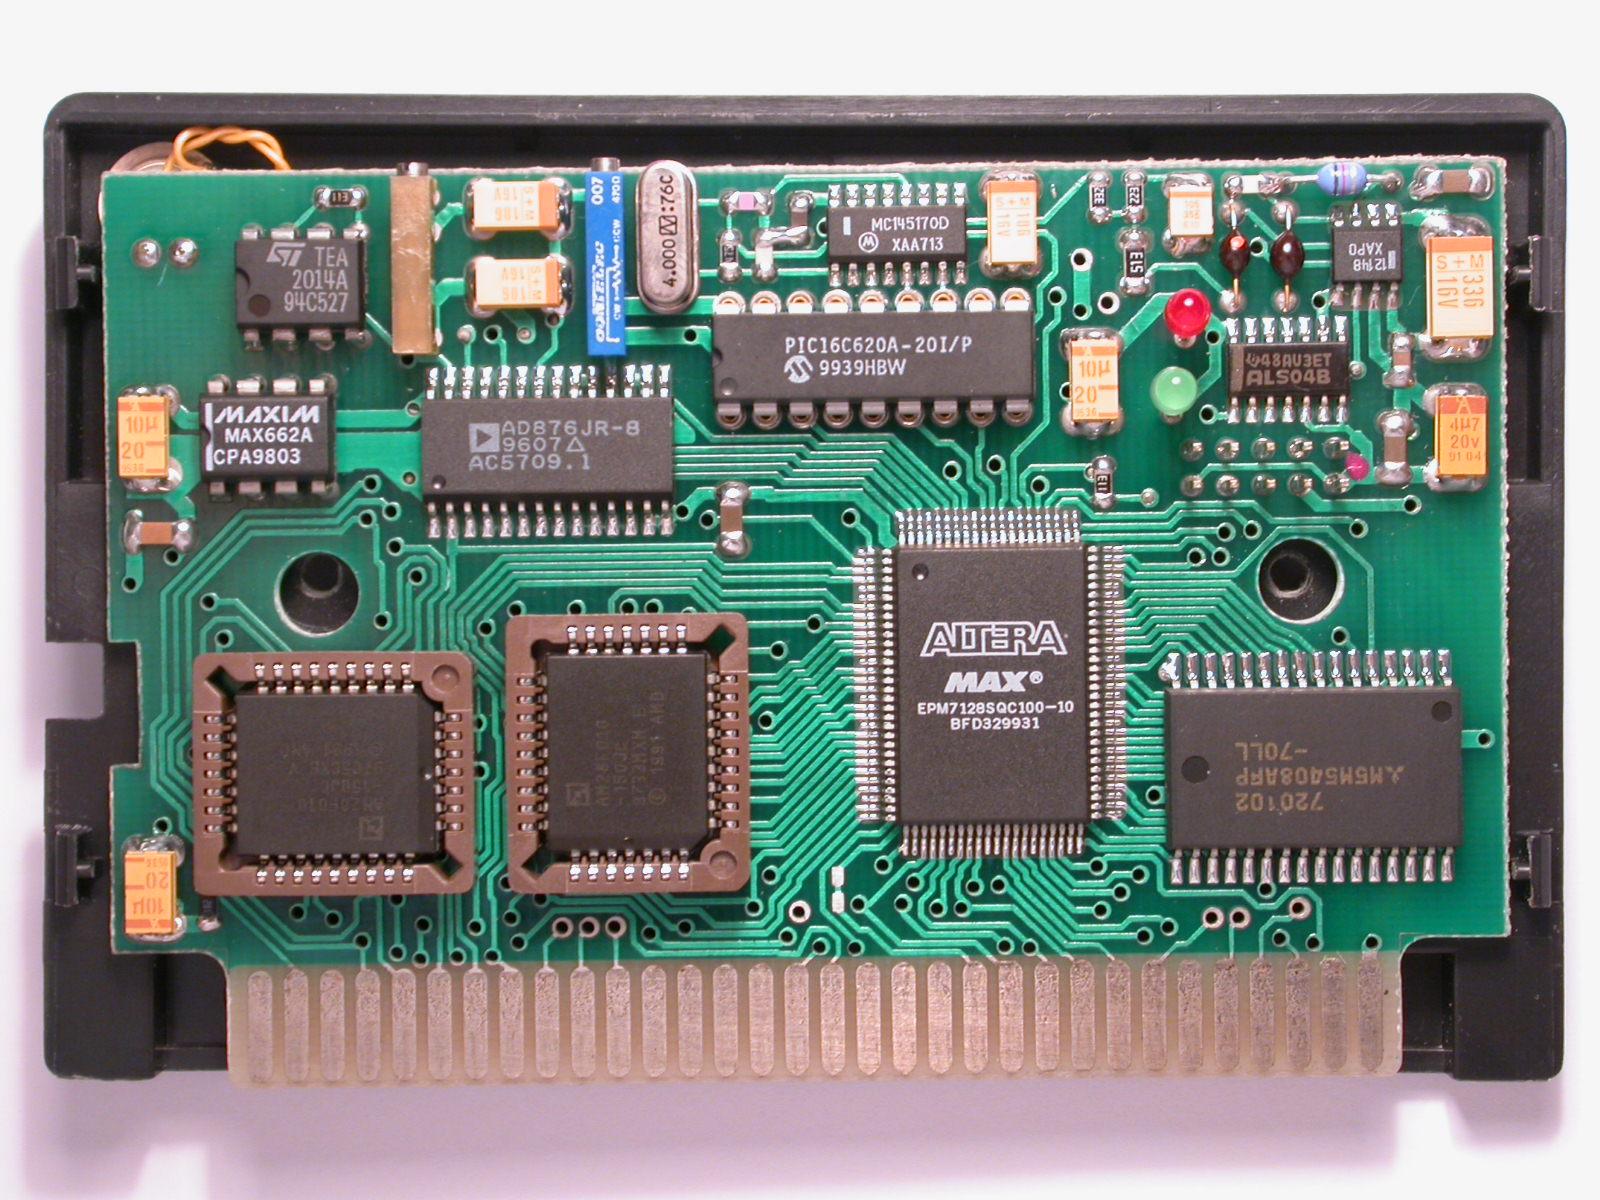 System Based On Sega Nomad Game Console For Analyzing Topography Of Electronic Circuit Jr Ispolzovanie Programmiruemyh Logicheskih Integralnyh Shem V Oftalmologicheskih Ustrojstvah Electronics Micro And Nanoelectronics